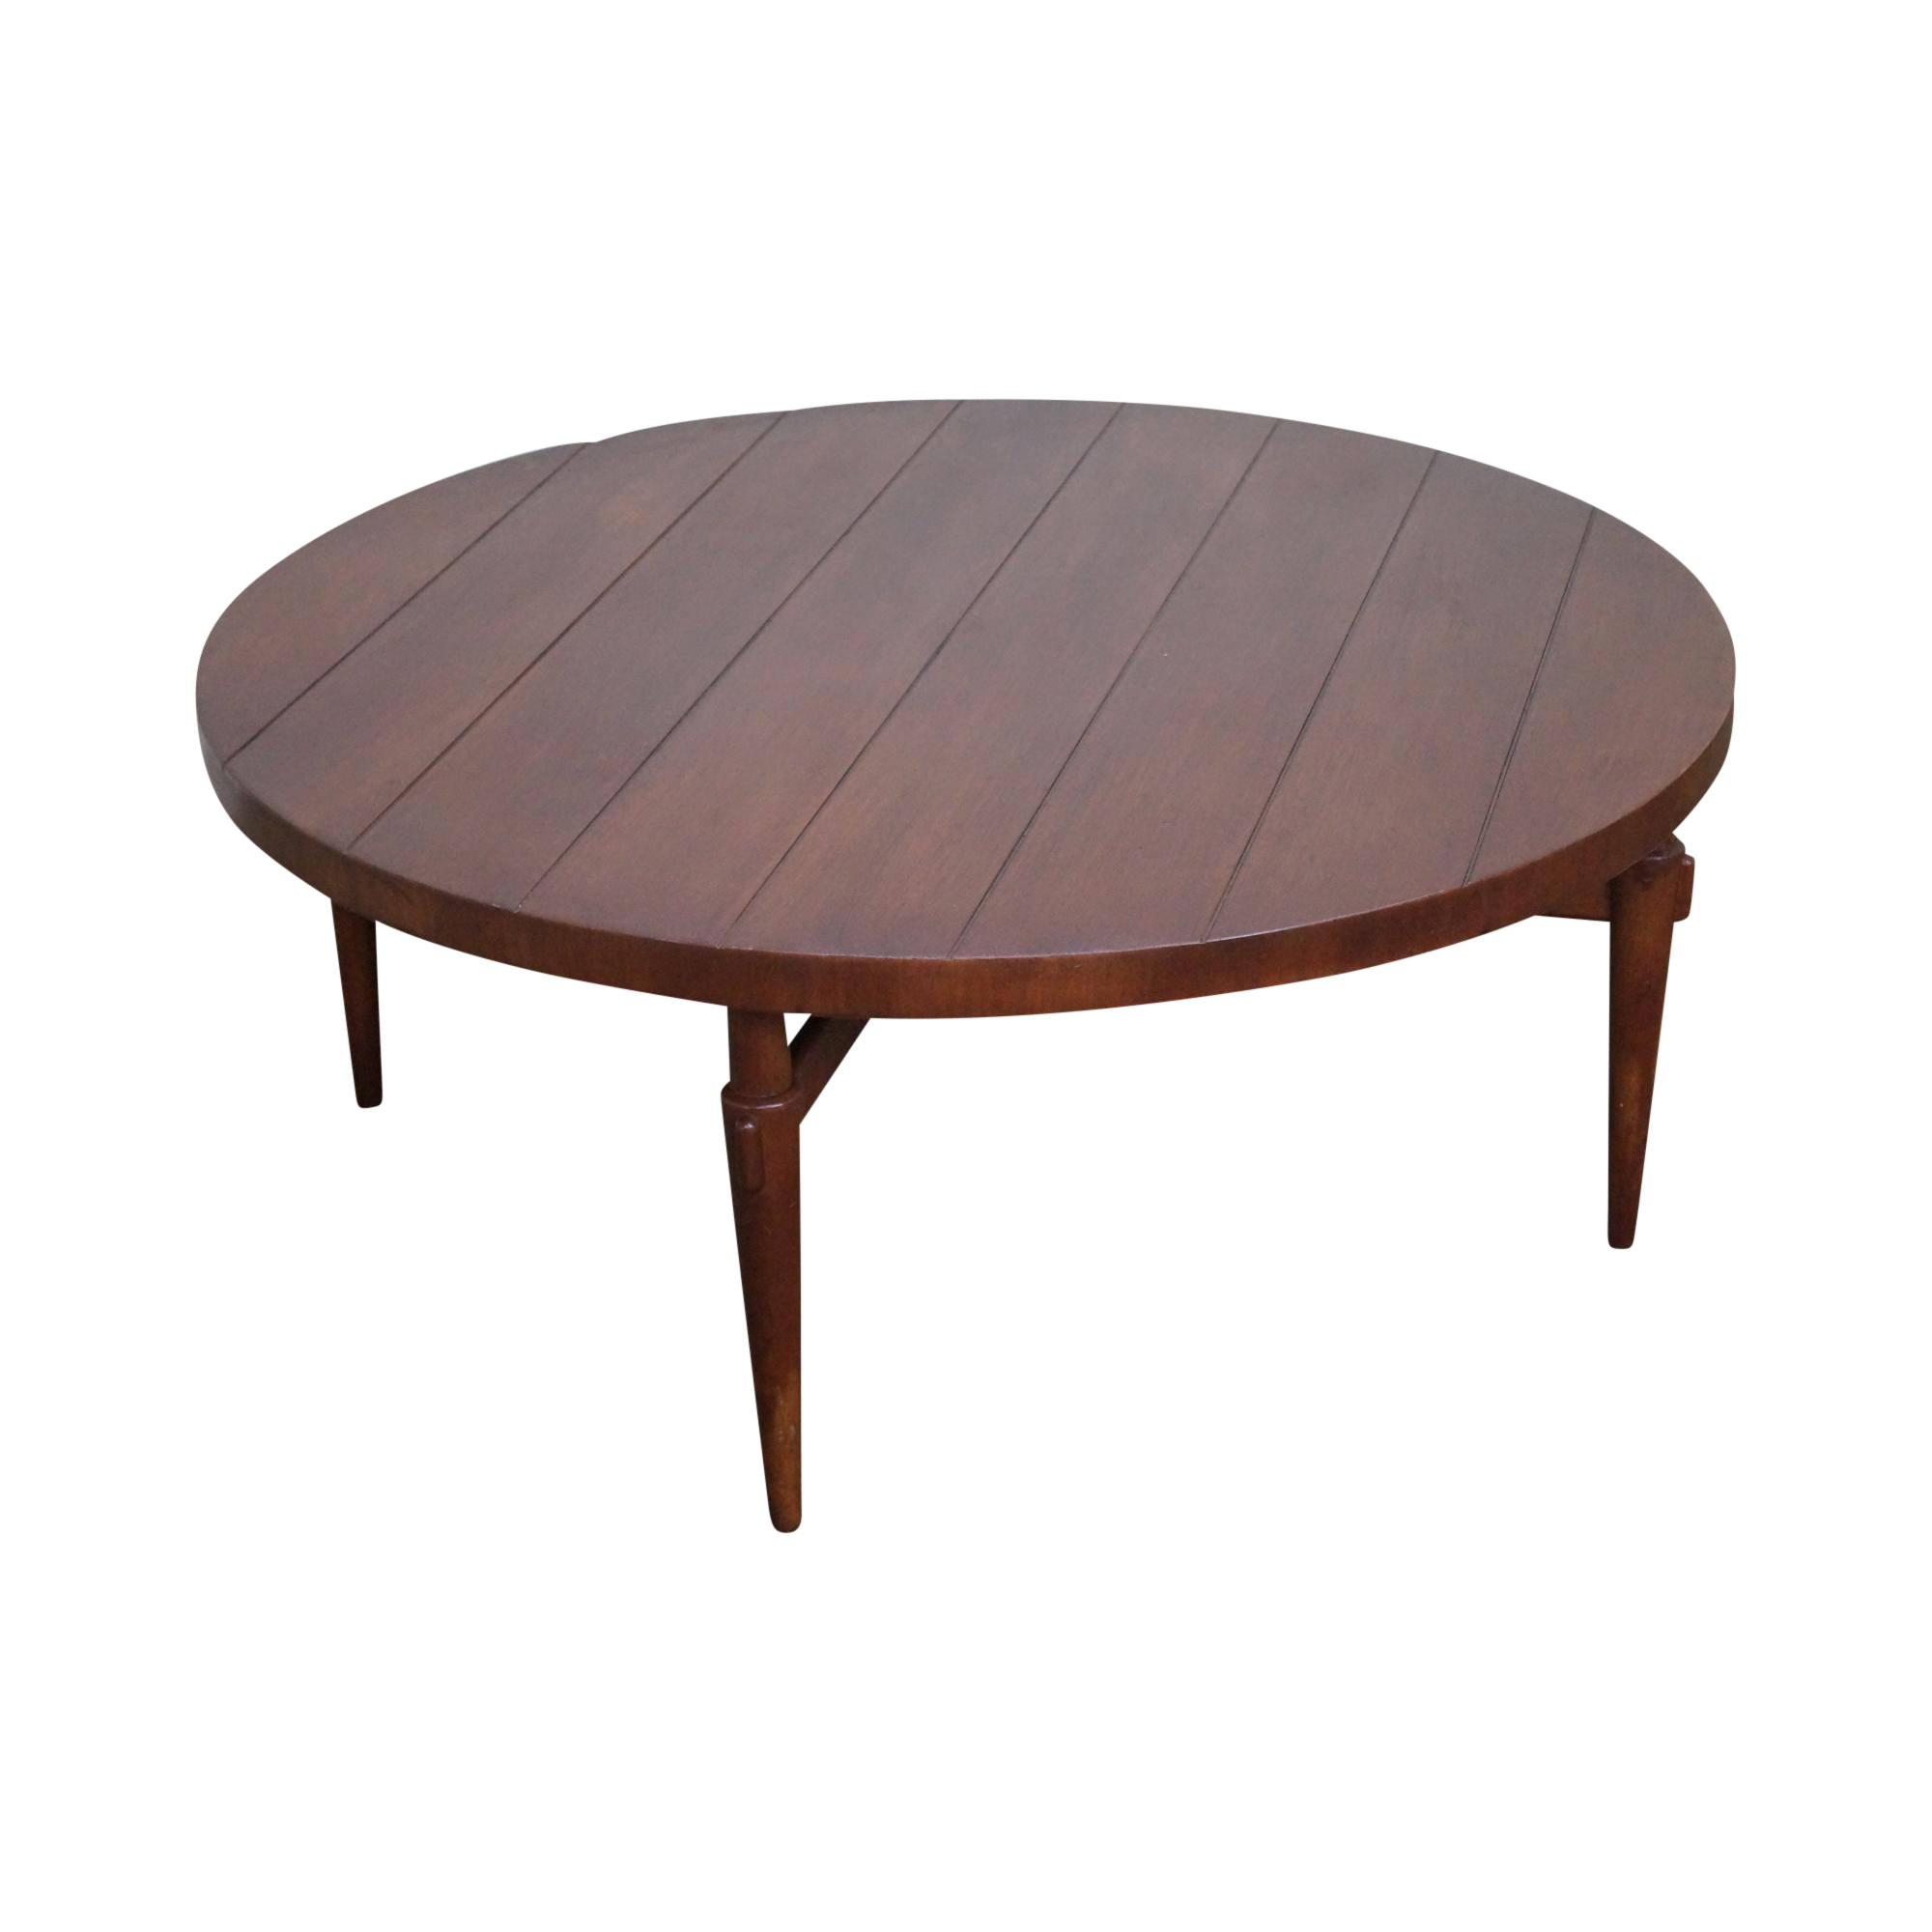 Round Mid Century Modern Coffee Table: Lane Mid-Century Modern Round Coffee Table